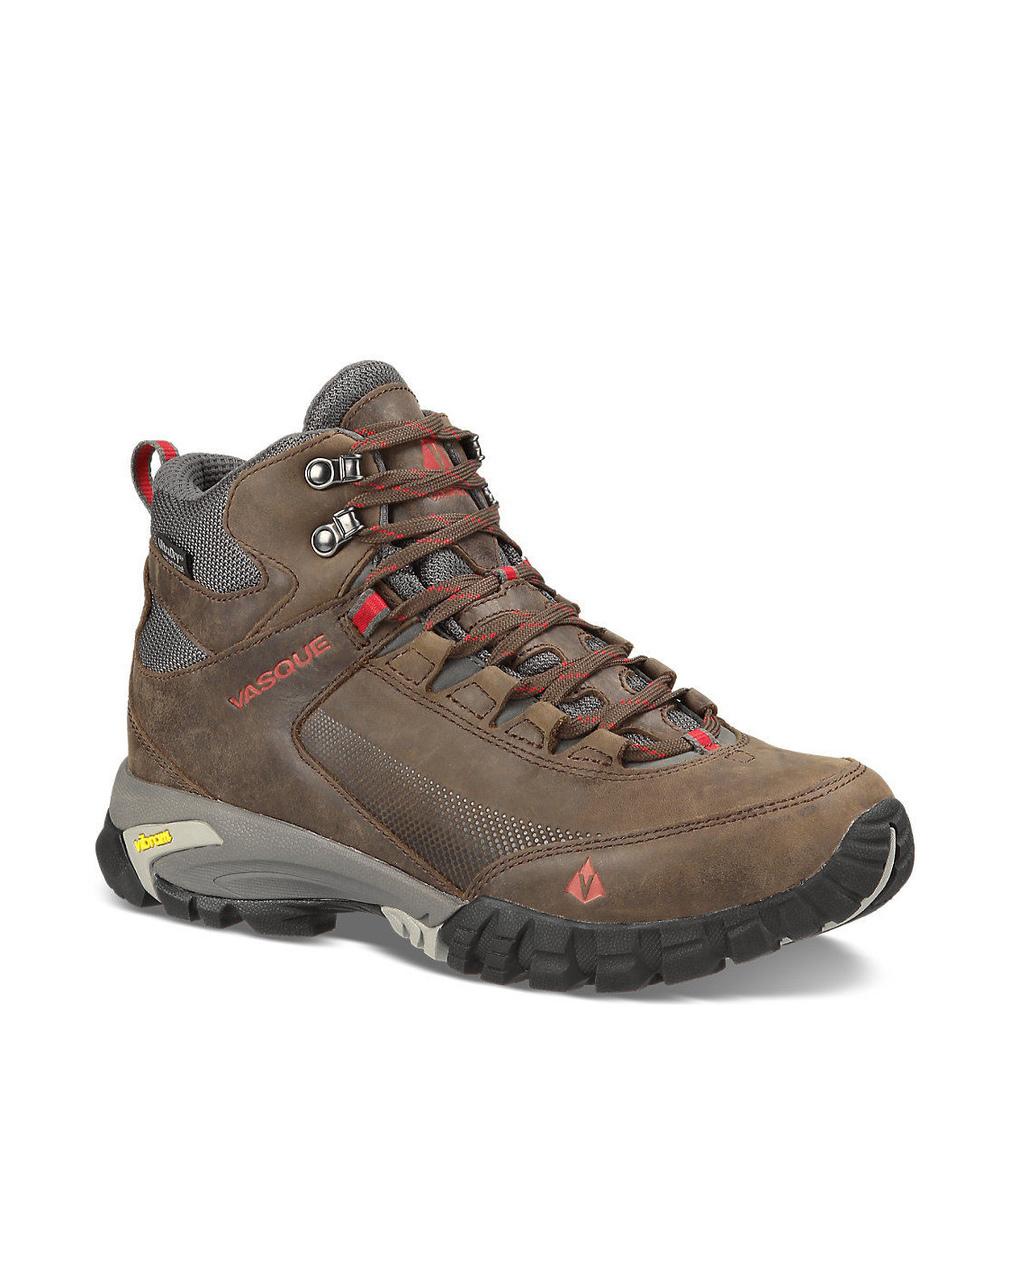 Vasque Talus Trek Ultradry Hiking Boots Price Breaker